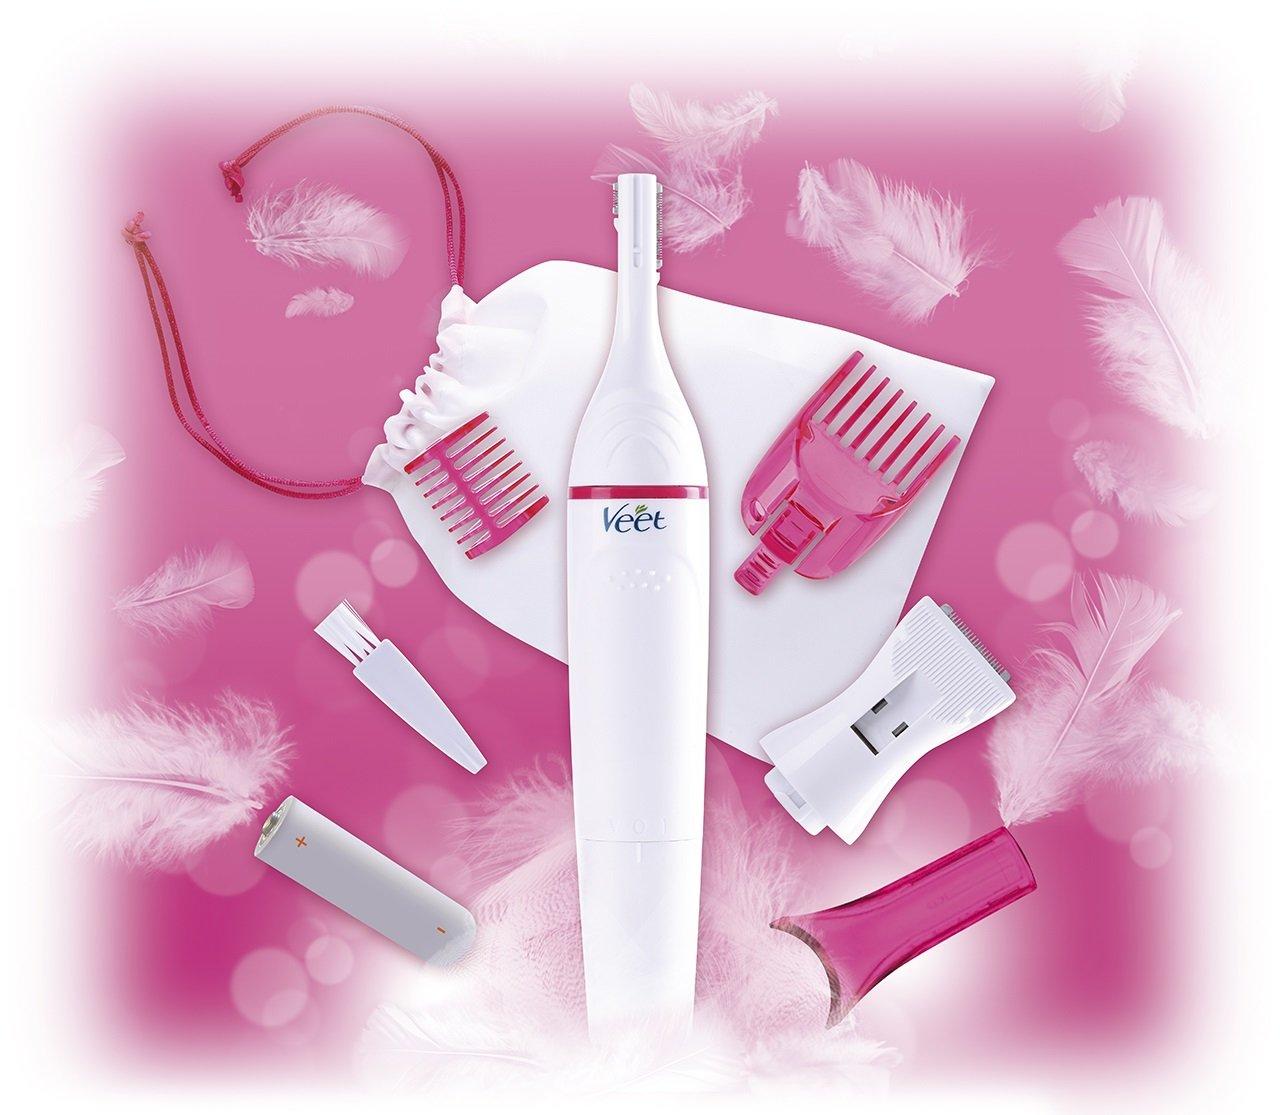 Veet Sensitive Precision Hair Removal Beauty Styler